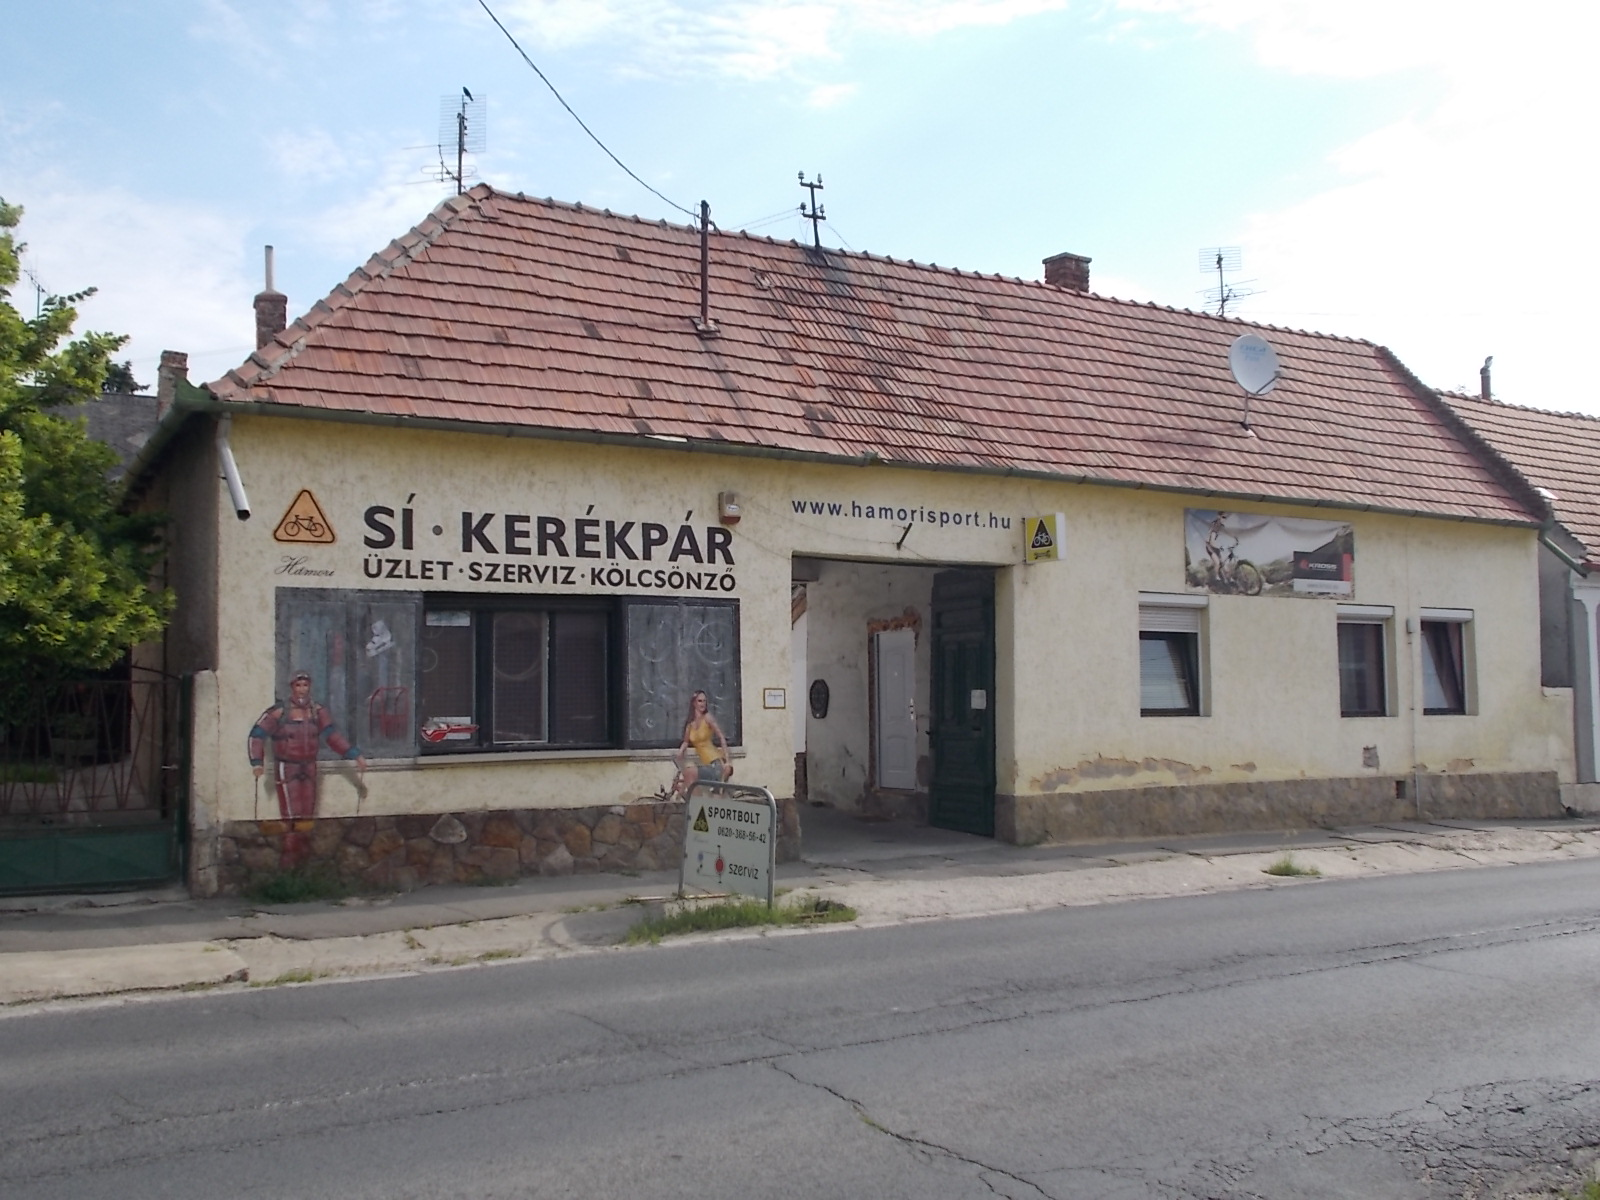 e8a855049c File:Kossuth Lajos utca 37, Kerékpárüzlet védett kapuval, 2017 Pomáz.jpg